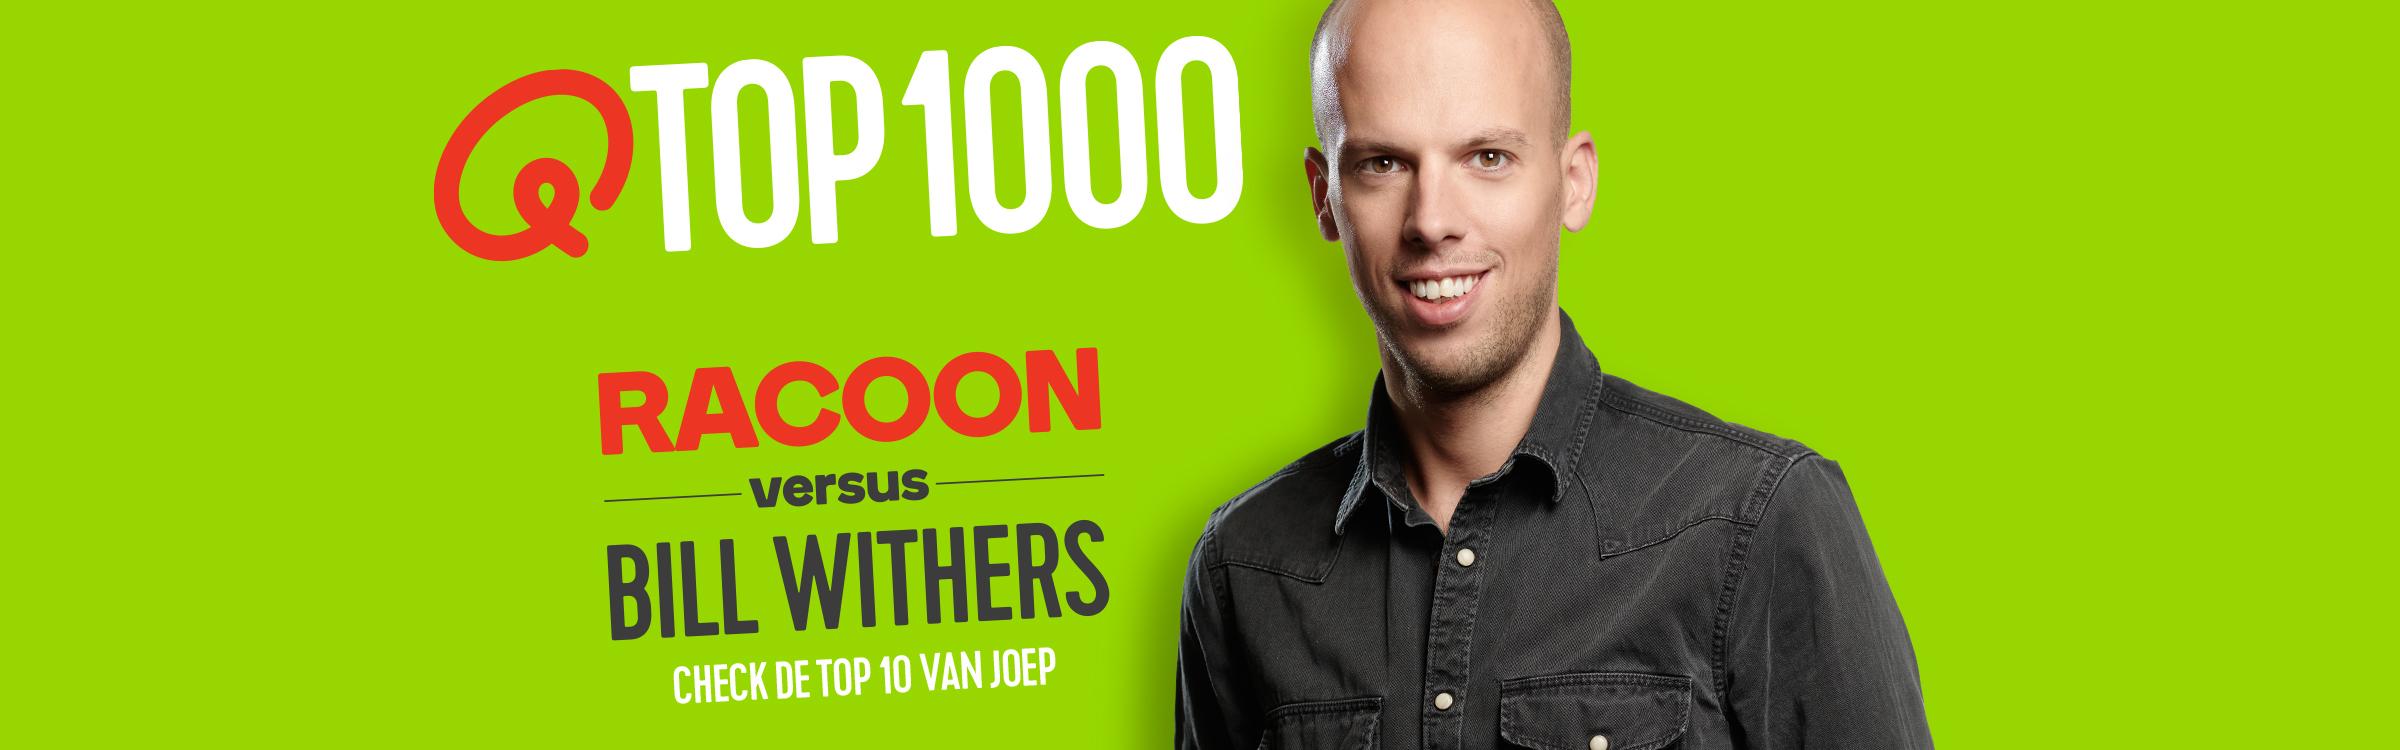 Qmusic actionheader top1000 djs joep